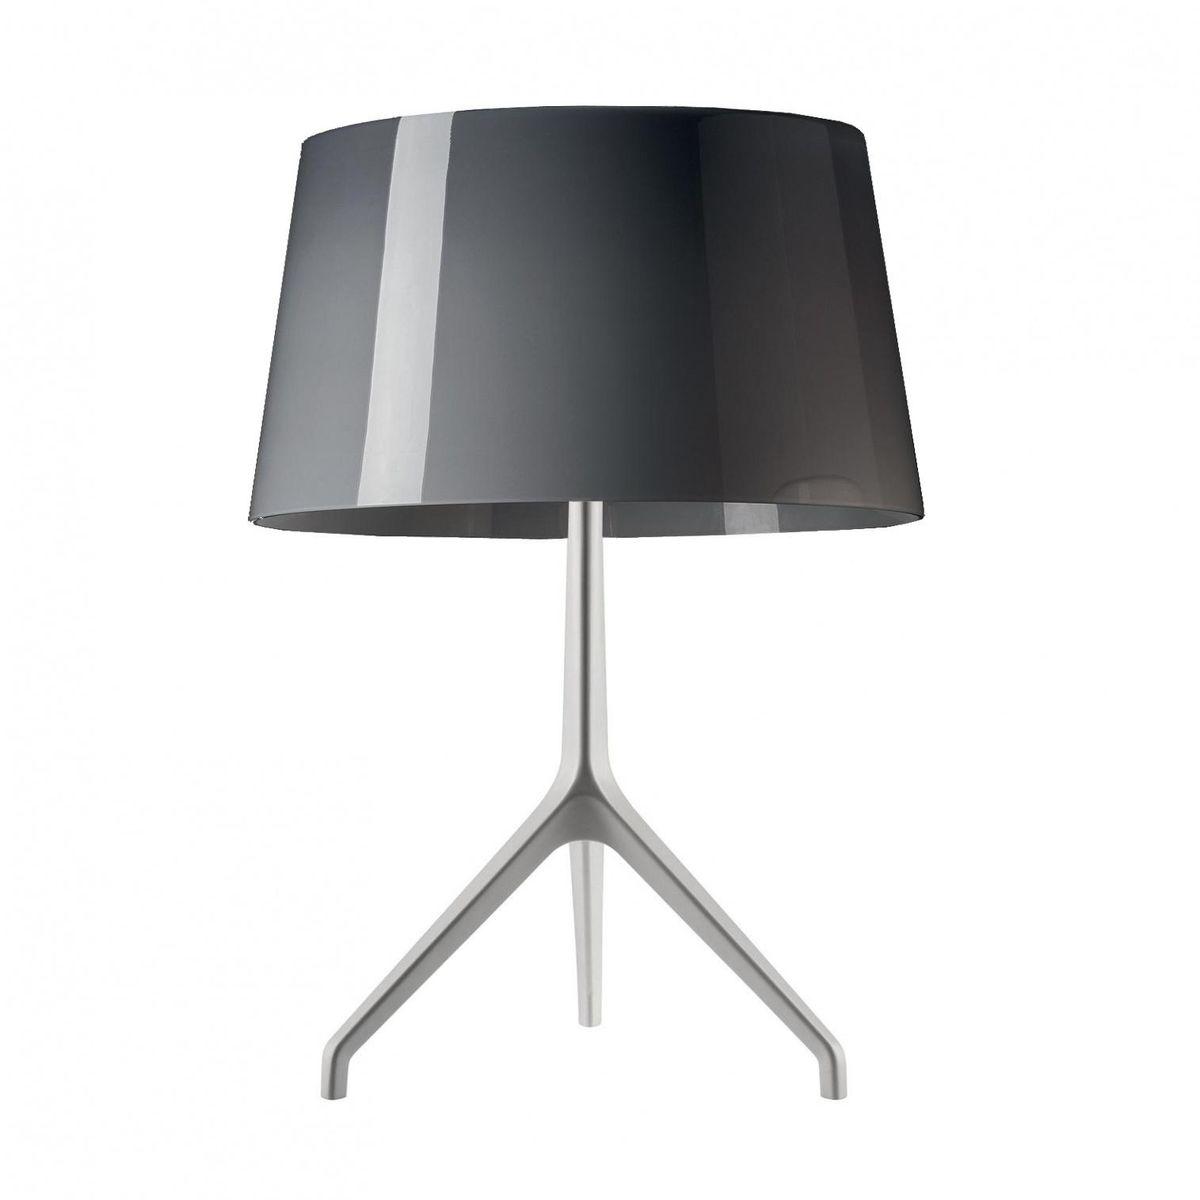 Lumiere xxs aluminium table lamp foscarini ambientedirect foscarini lumiere xxs aluminium table lamp greyframe aluminiumh 40cm geotapseo Image collections